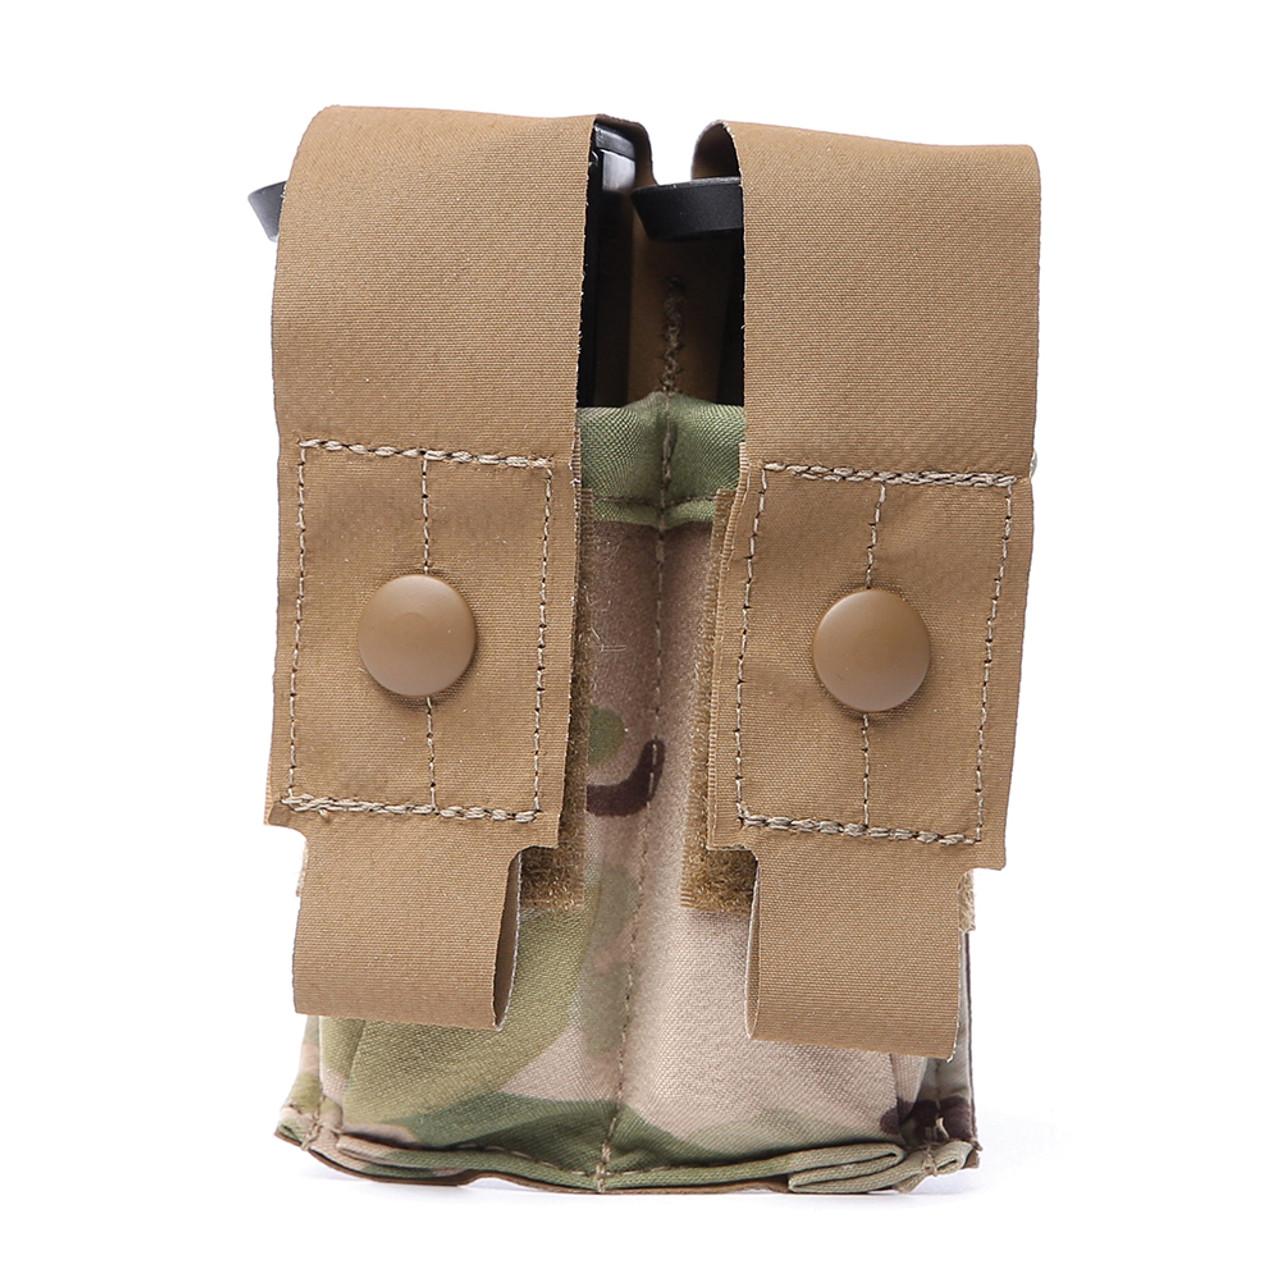 4e1520616437 hts double m9 magazine pouch hero